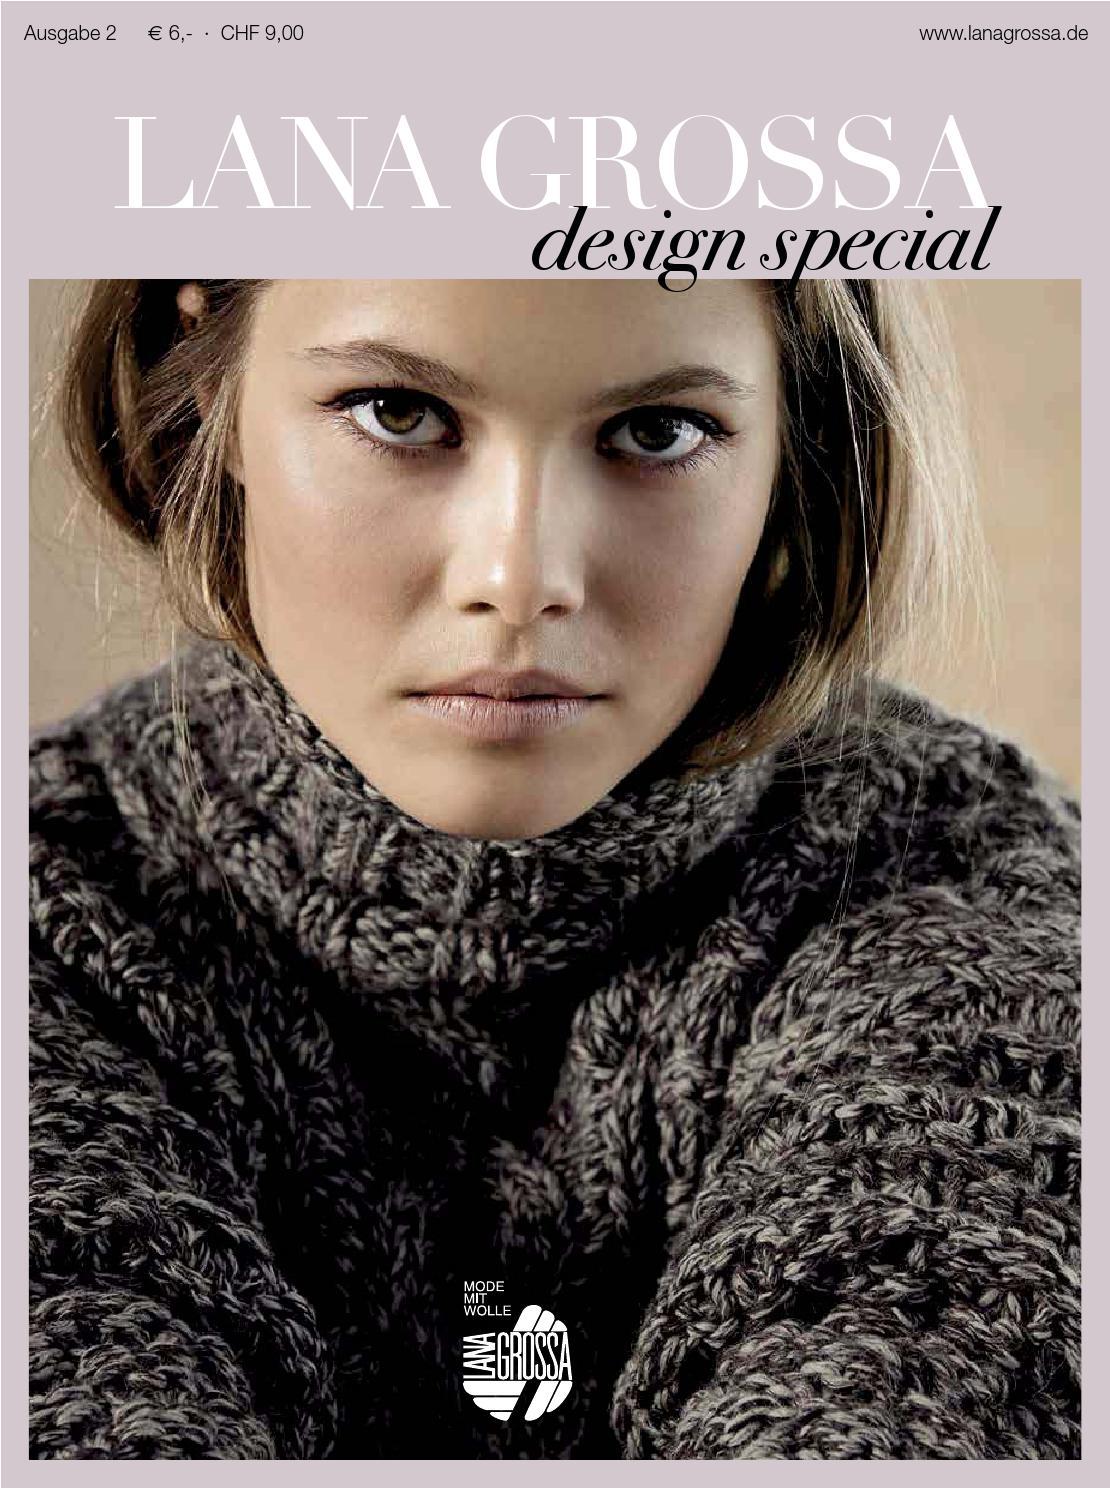 Lana grossa design special 02 by filati wolle handstrick mode issuu - Lana grossa diva ...